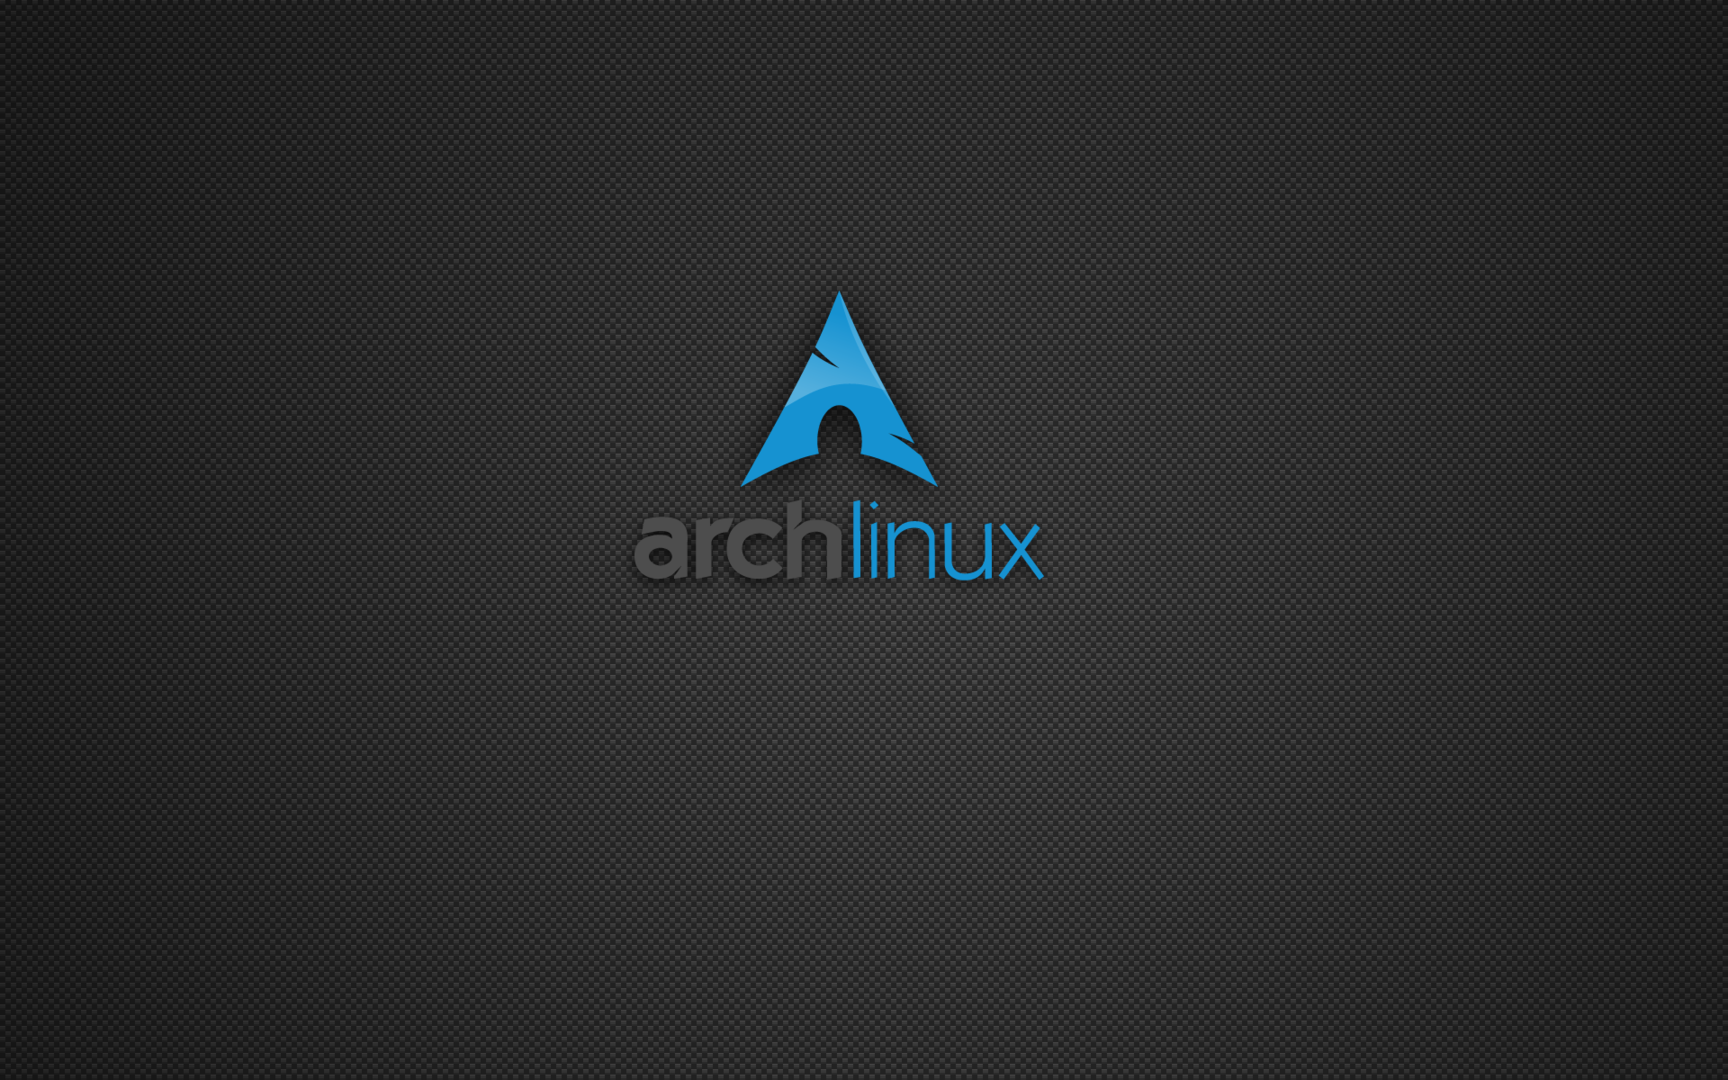 Arch Linux wallpaper 15408 1728x1080